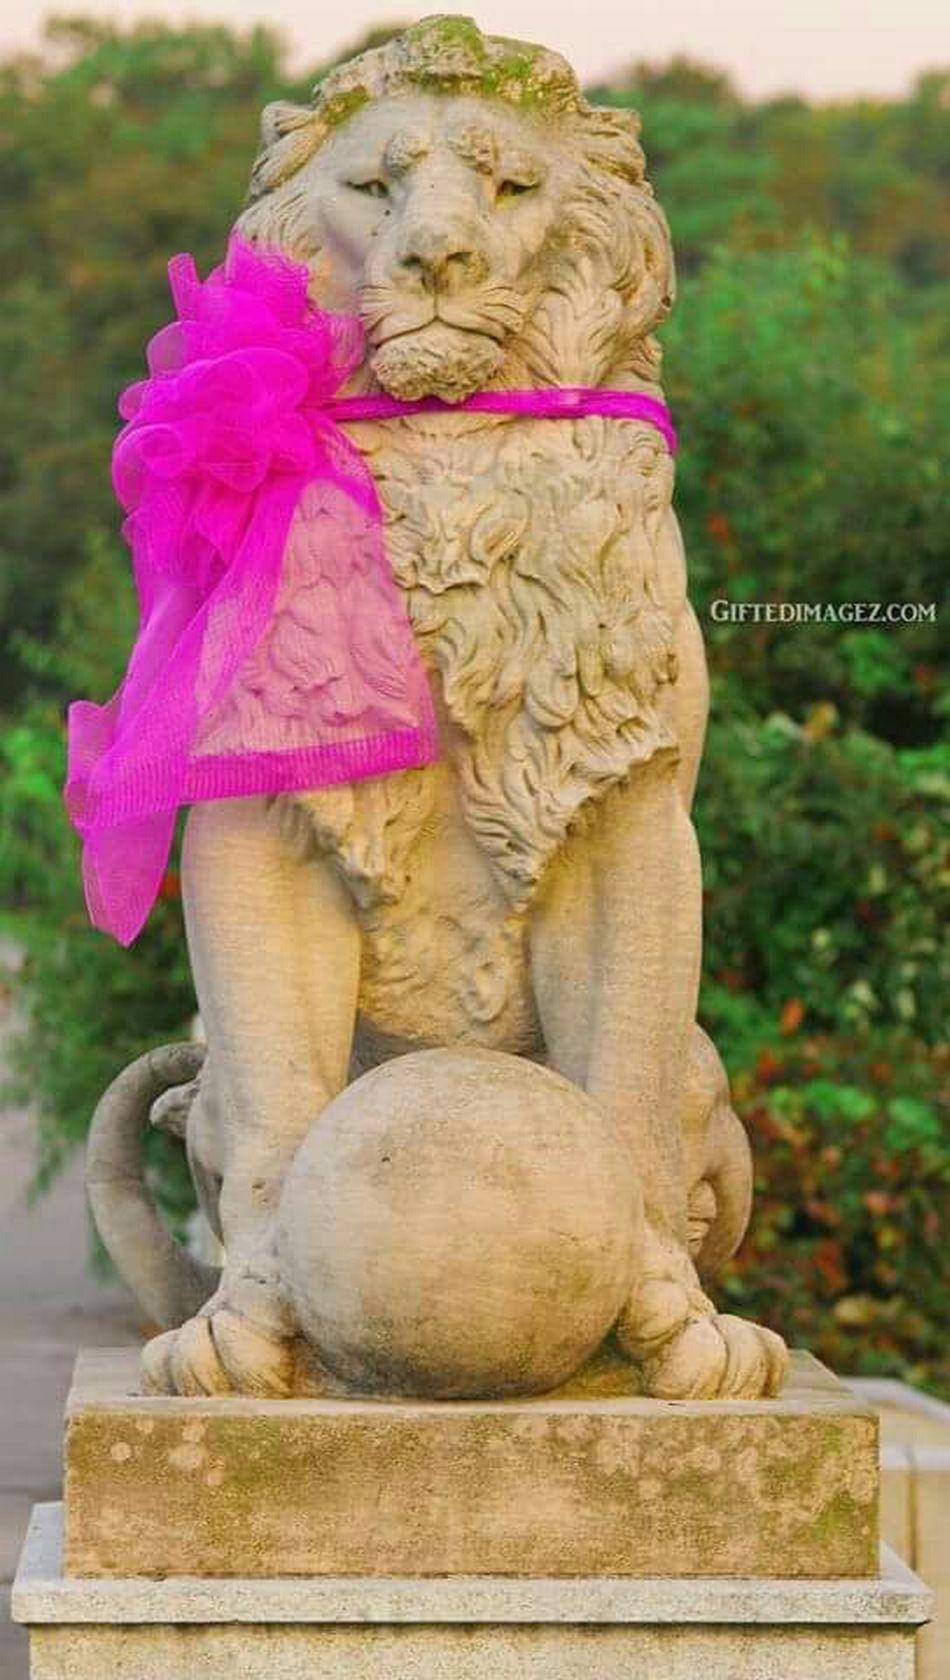 Lions Vaphotography Lionstatues Photographer Outdoor Photography Tamron 70-200mm F/2.8 Landscape_photography